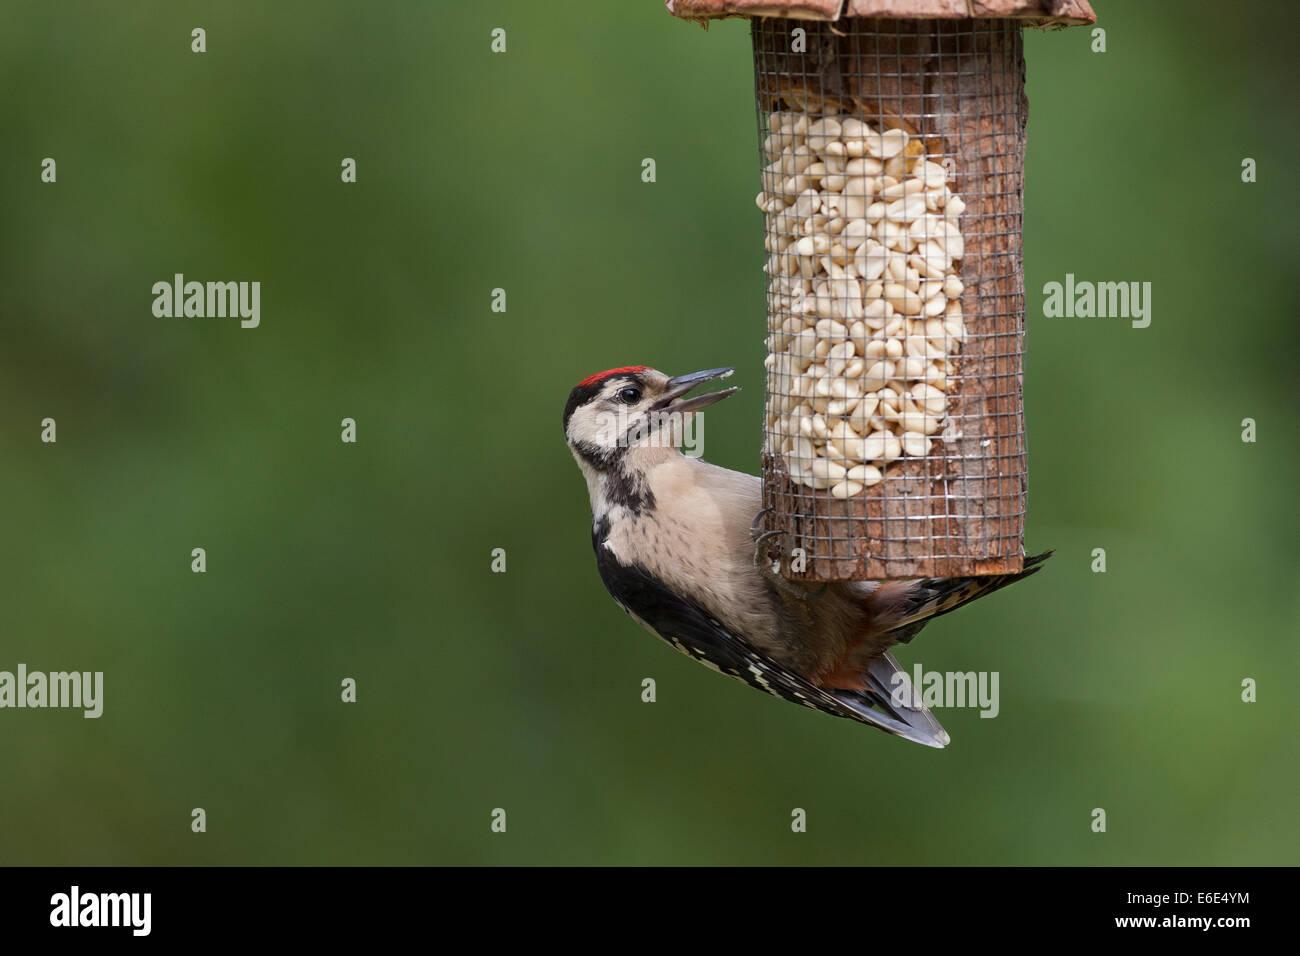 Great Spotted Woodpecker, bird's feeding, Buntspecht, Vogelfütterung, Vogelfutter, Dendrocopos major, Vogelfutter, Stock Photo